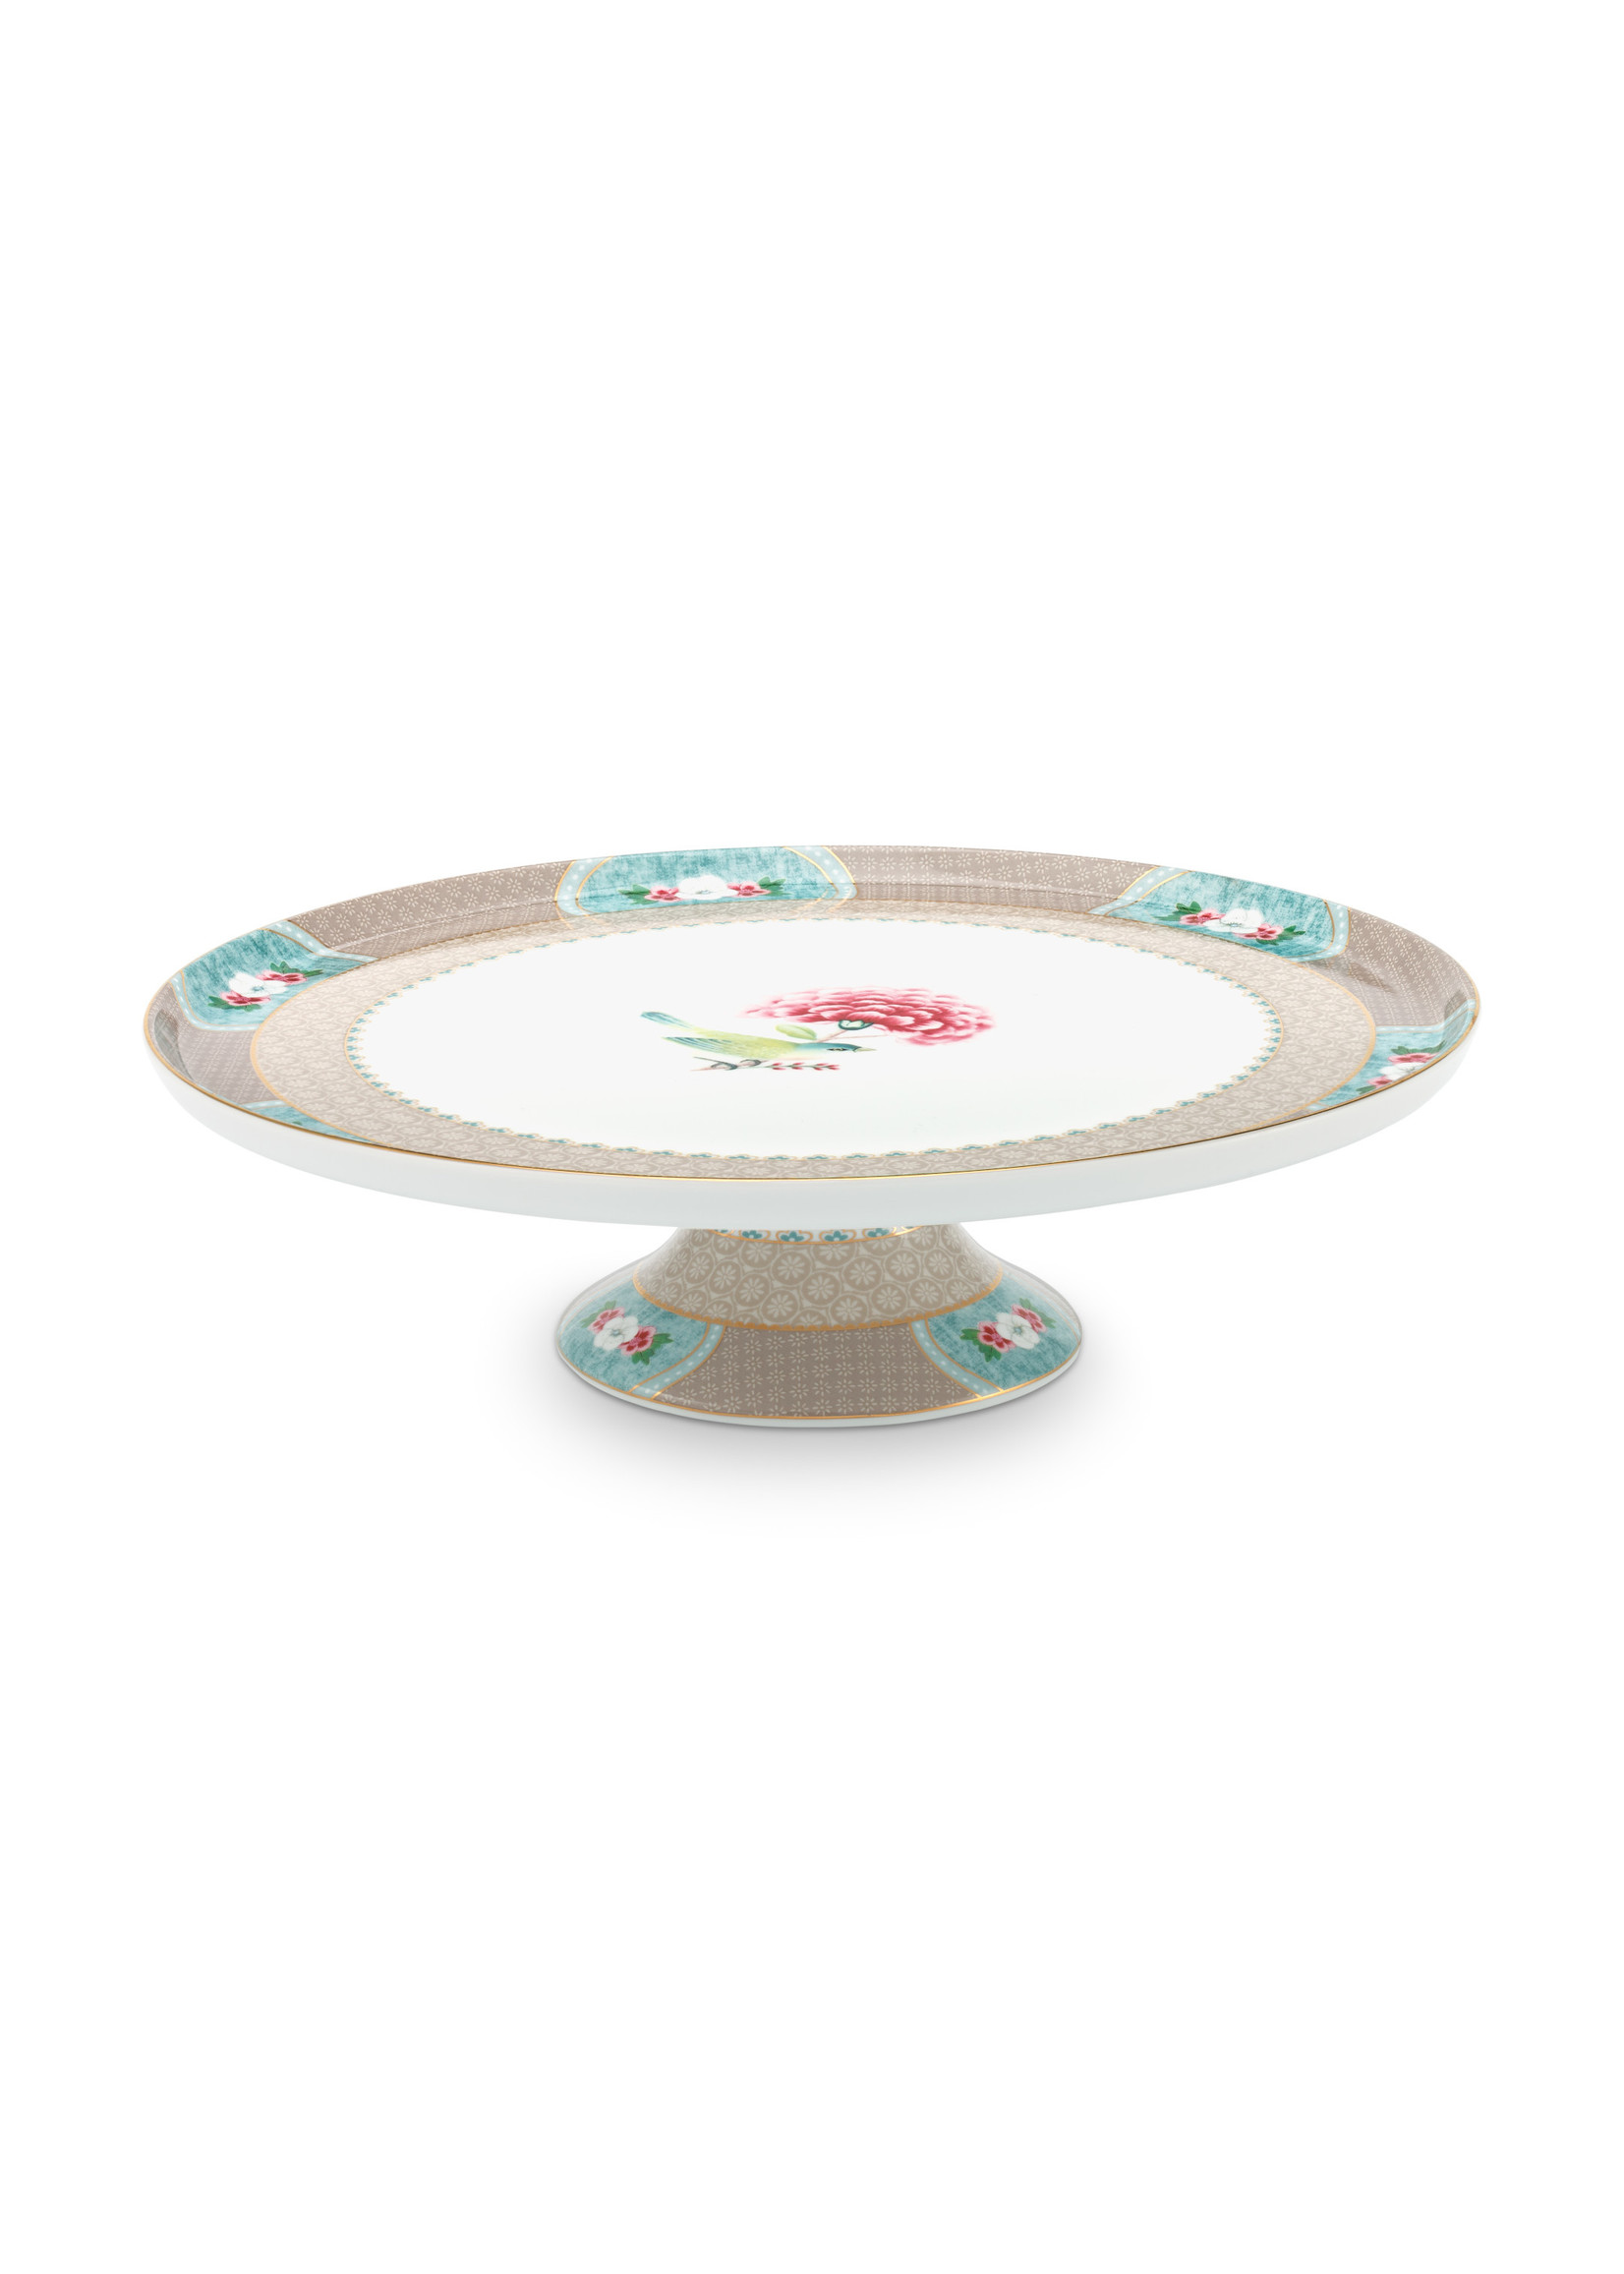 pip studio Cake Tray Blushing Birds Khaki 30.5cm